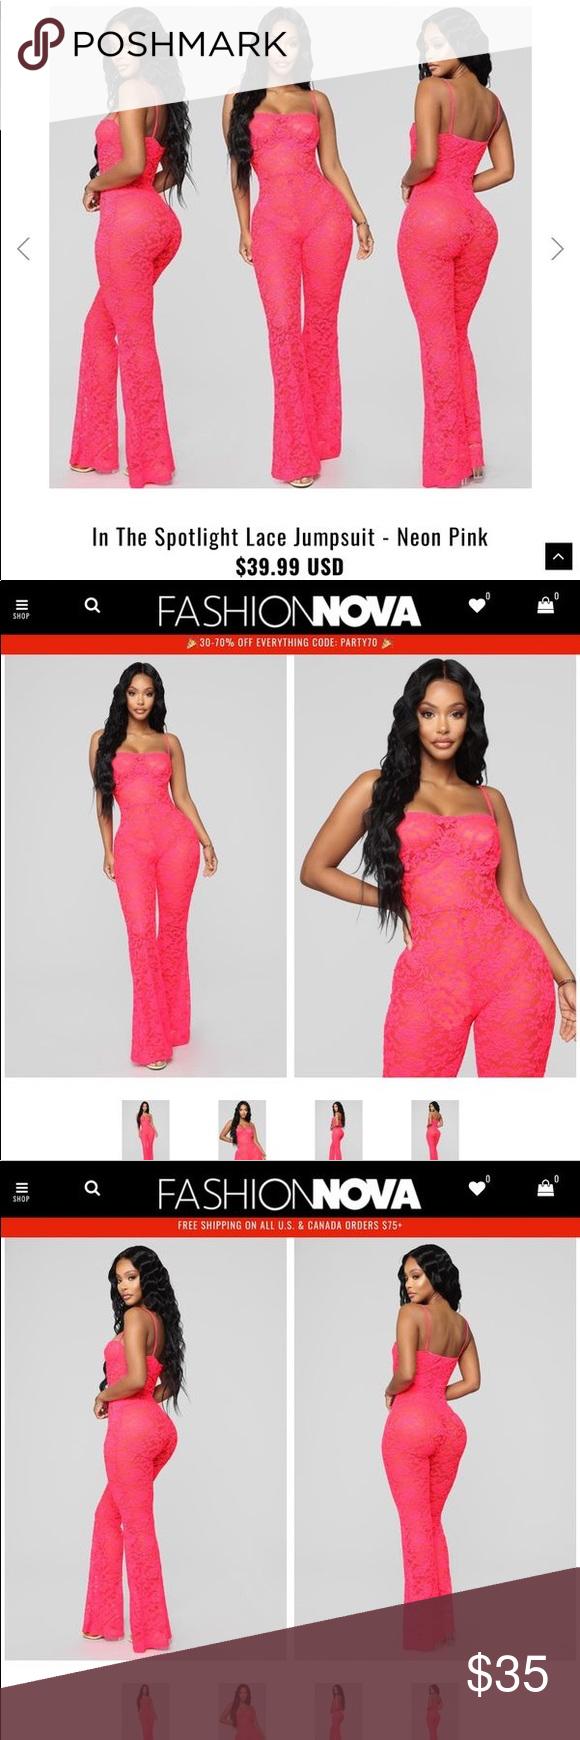 740f2a0ddef Fashion Nova Pant Jumpsuit. Fashion Nova